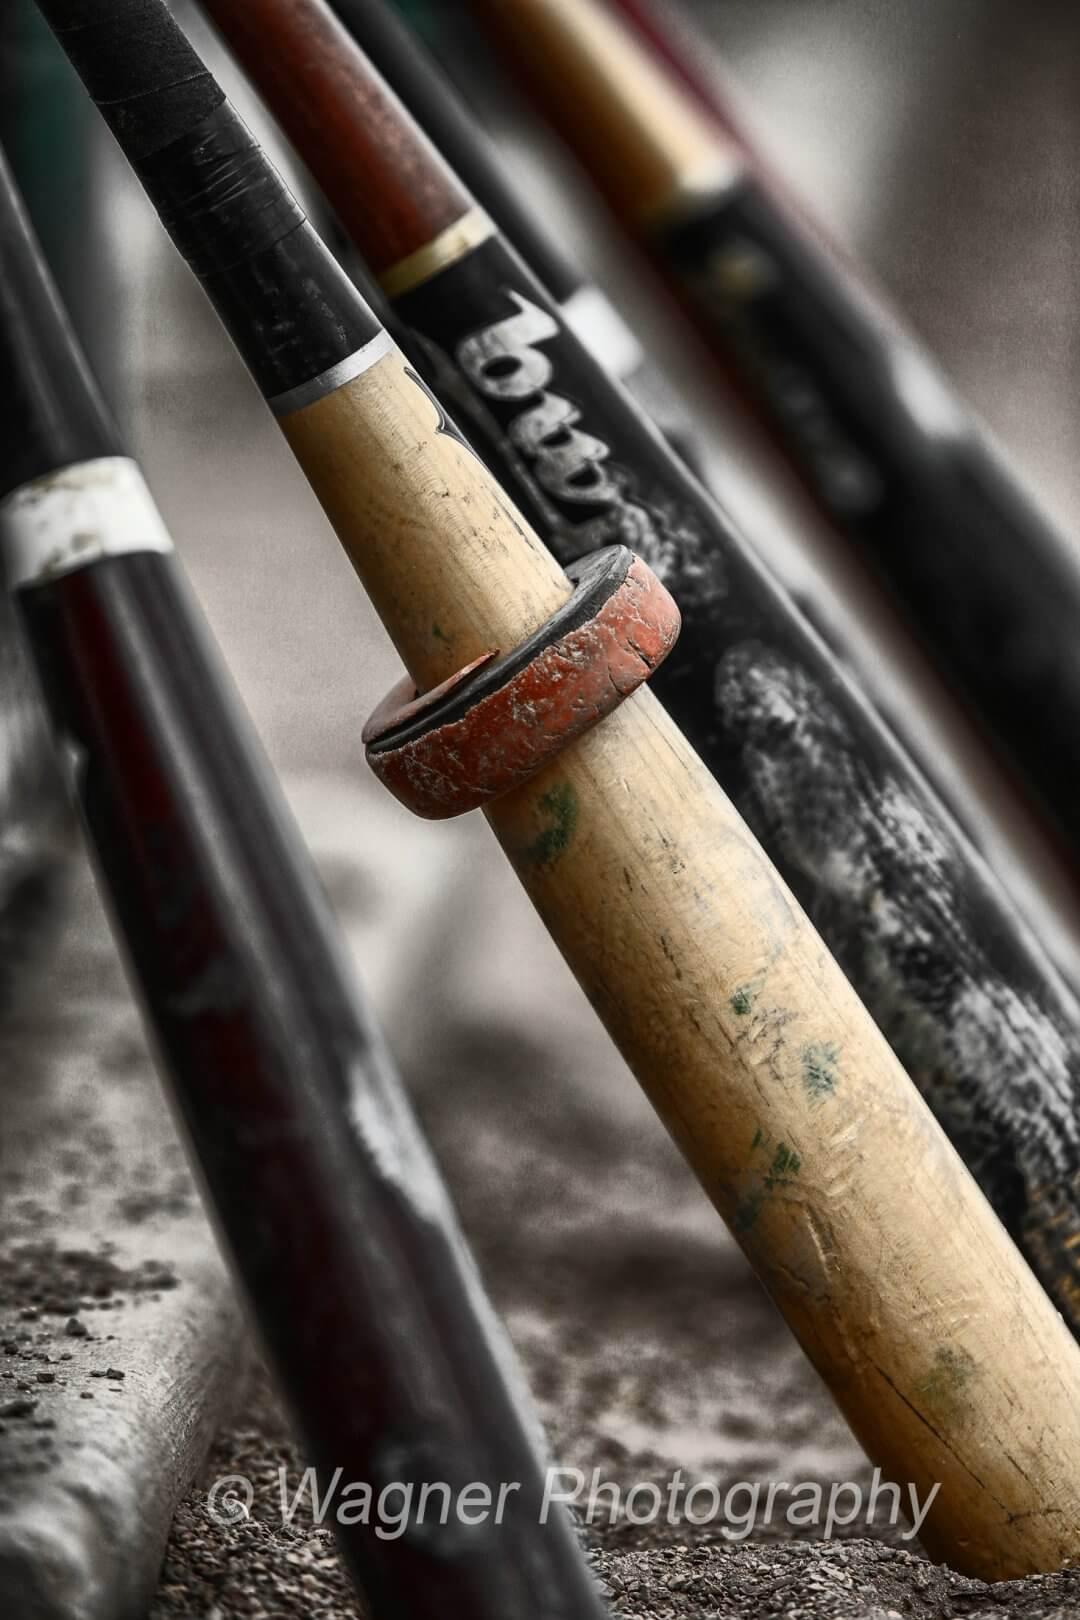 Game Bats